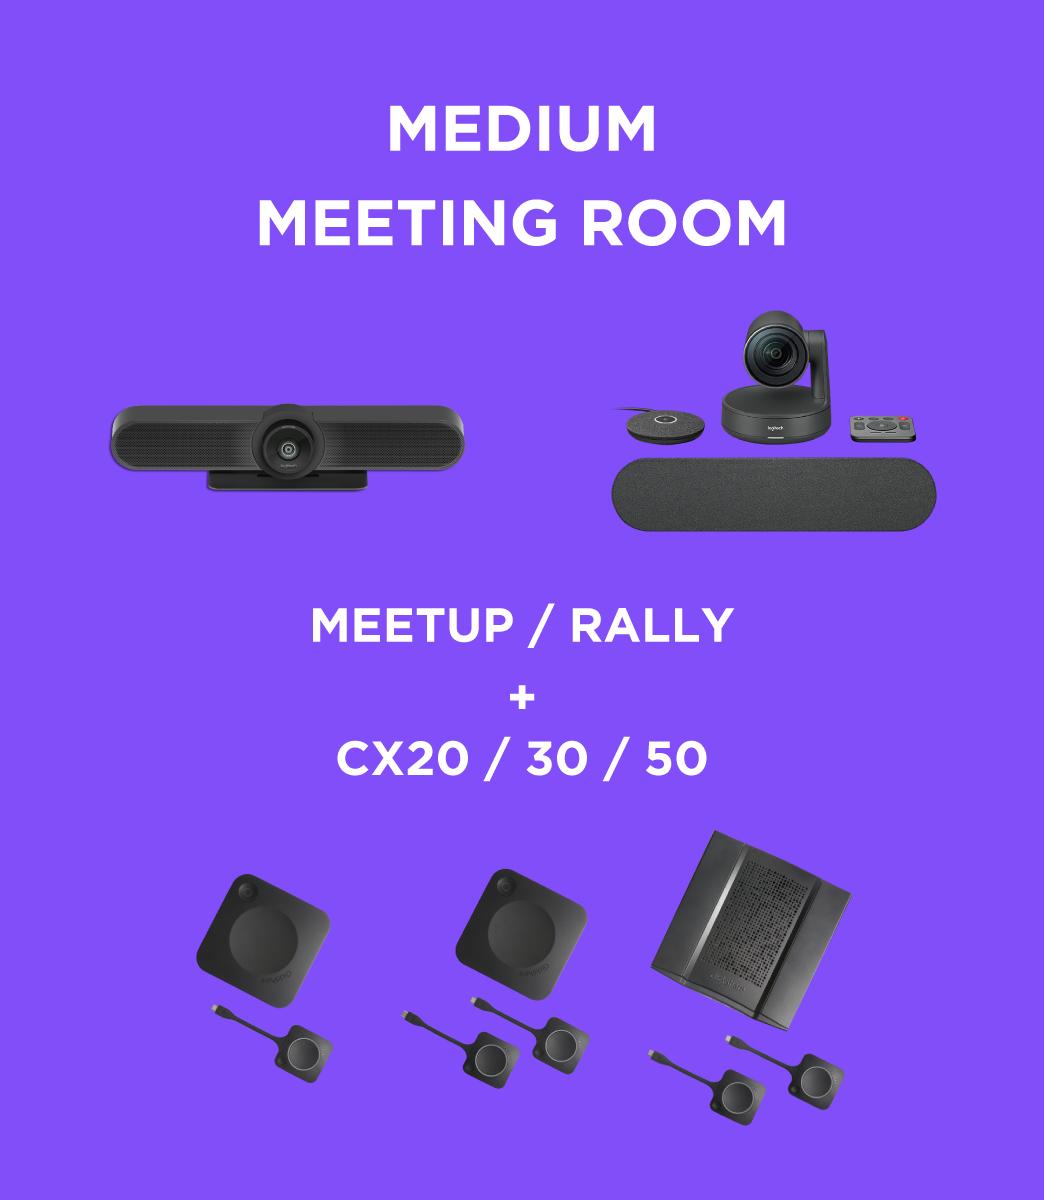 Meetup Rally for Medium Meeting Room